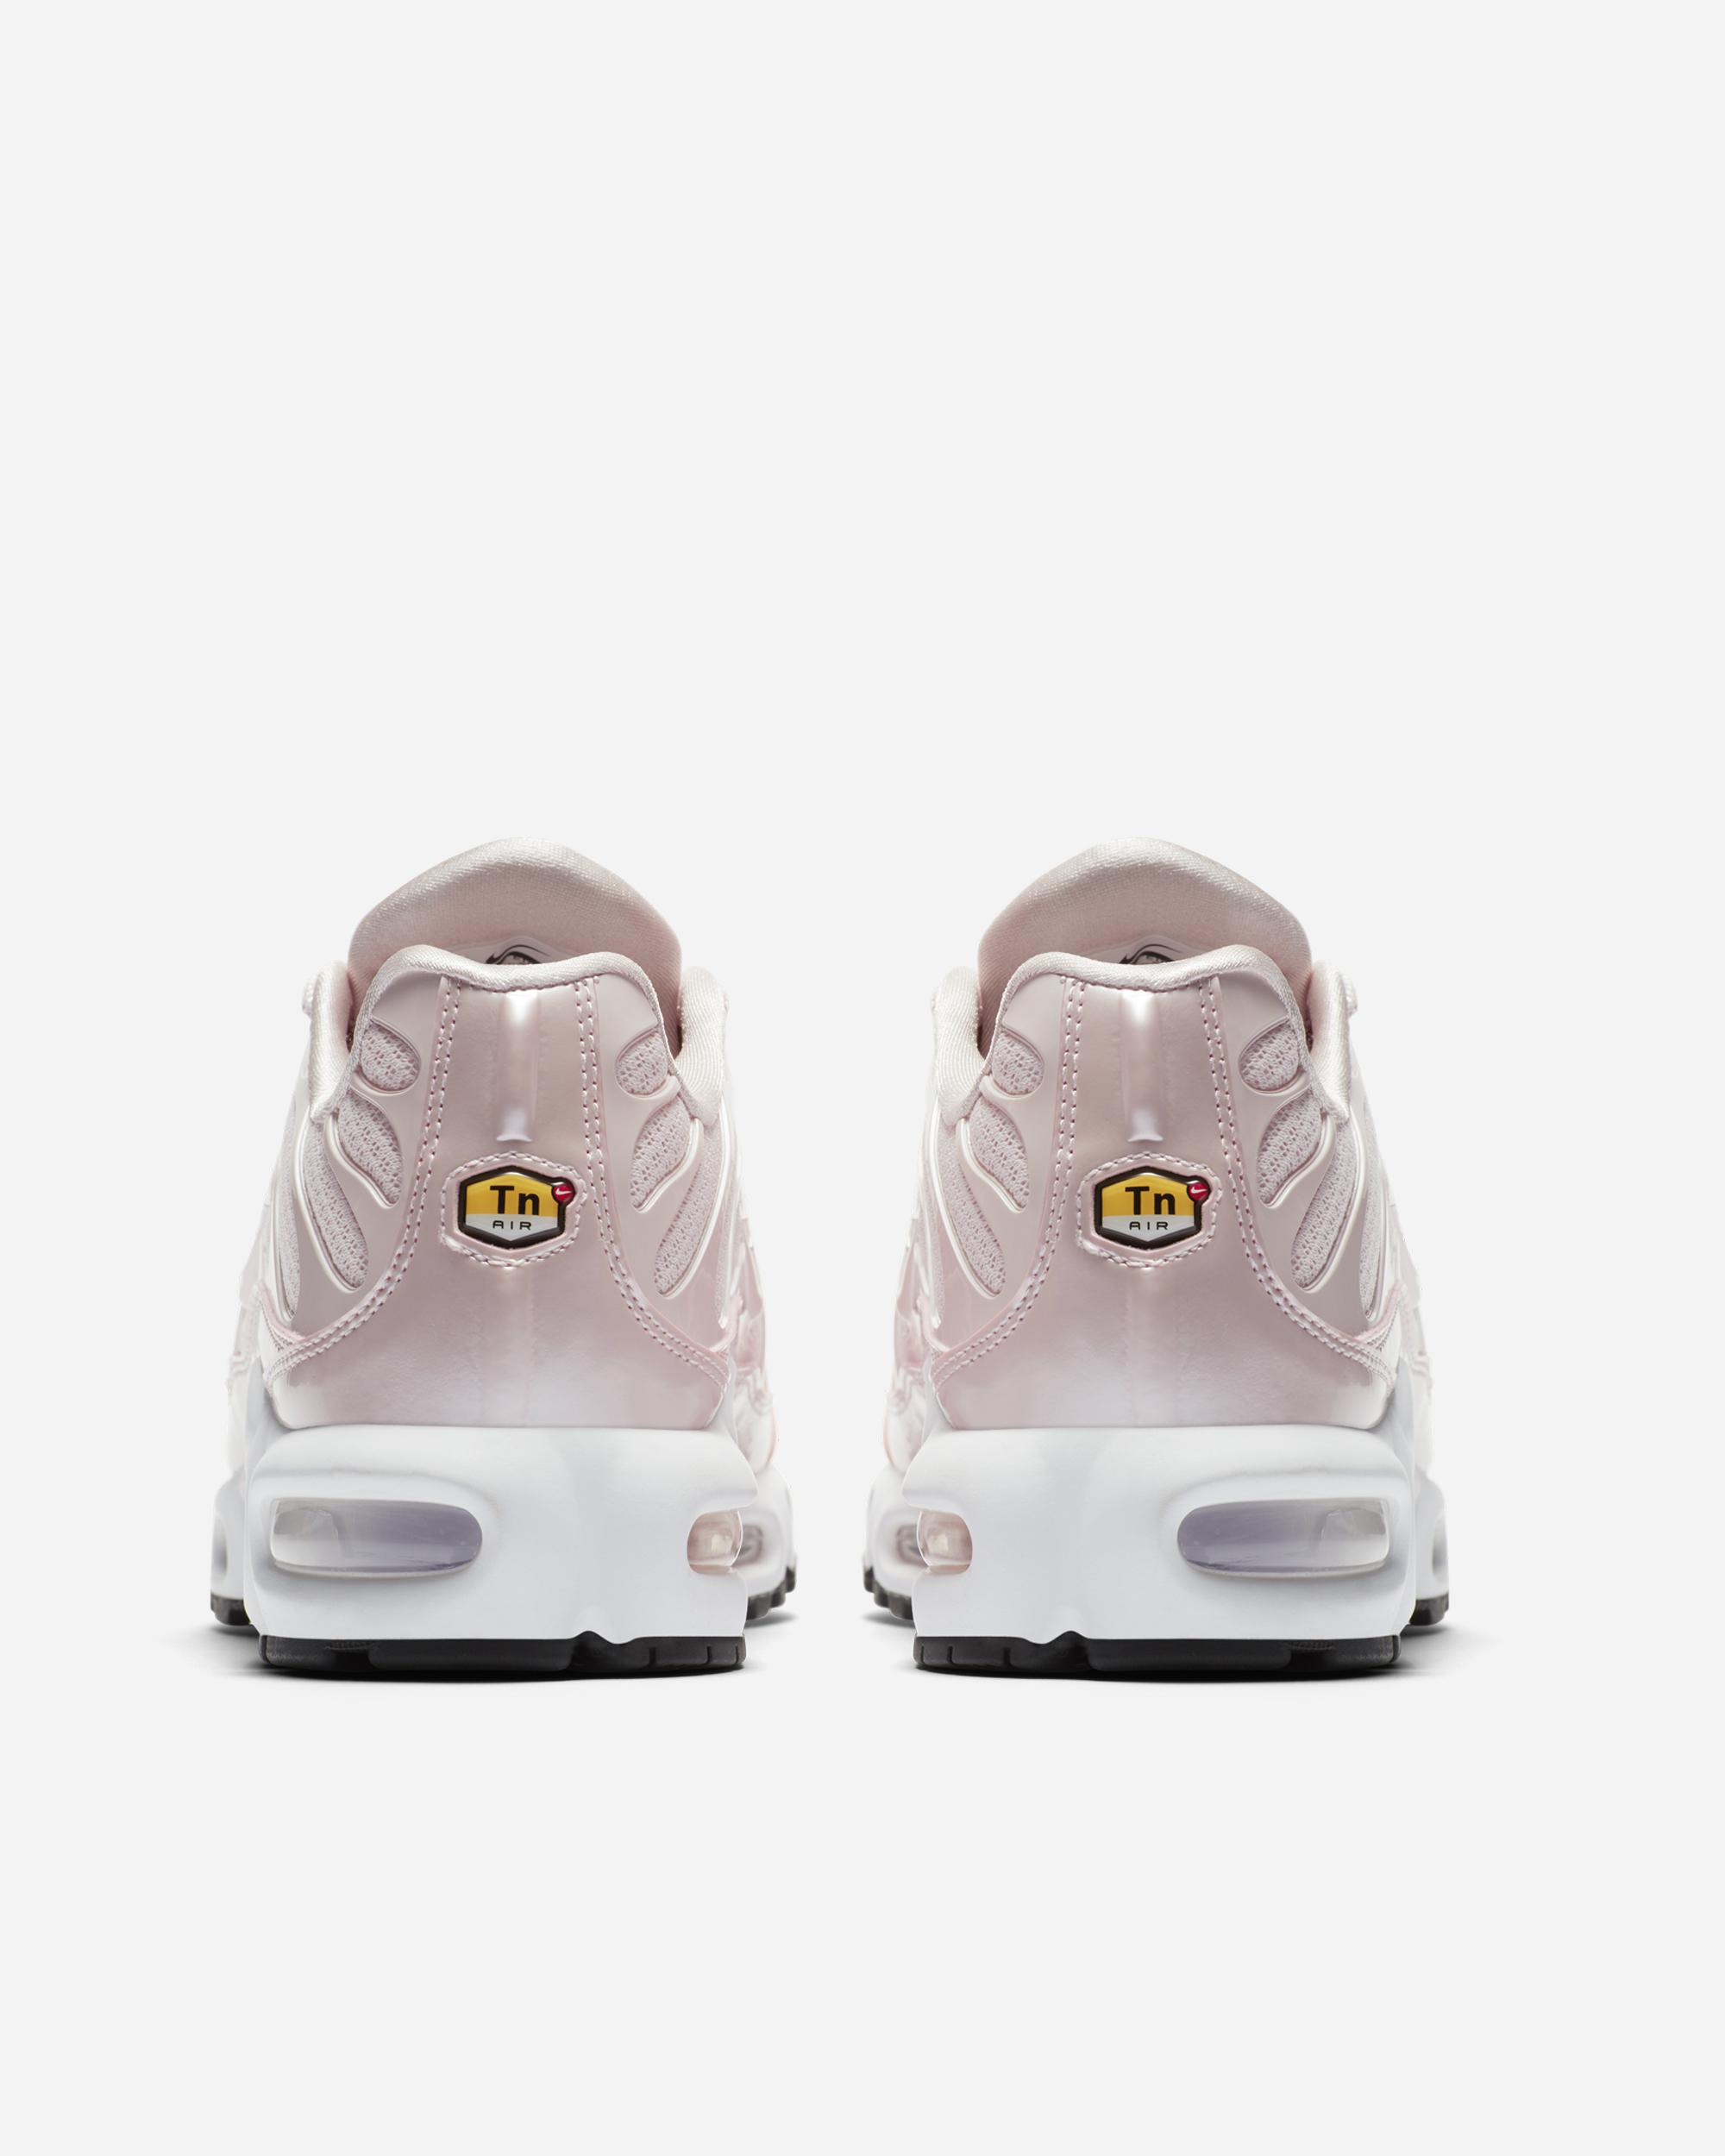 Nike Sportswear Air Max Plus TN Premium Barely Rose/Black | 848891 601